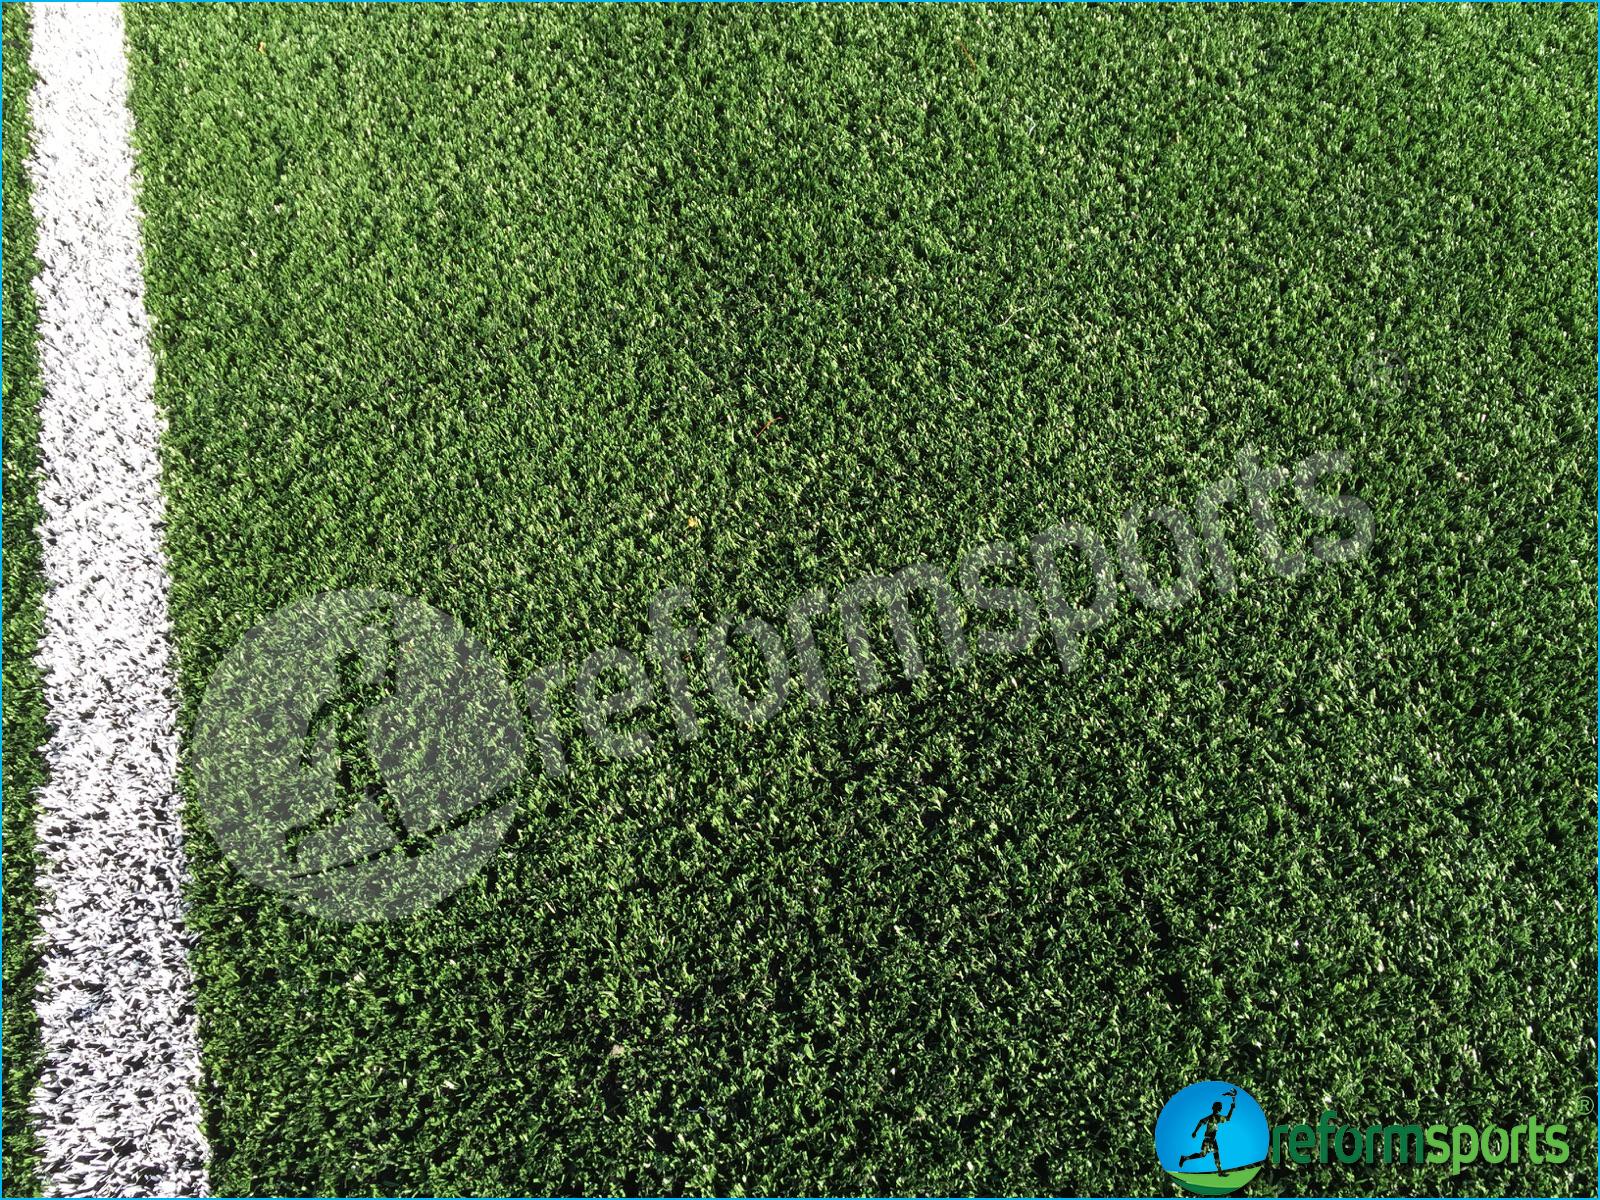 bursa suni çim satışı, bursa sentetik çim satışı,